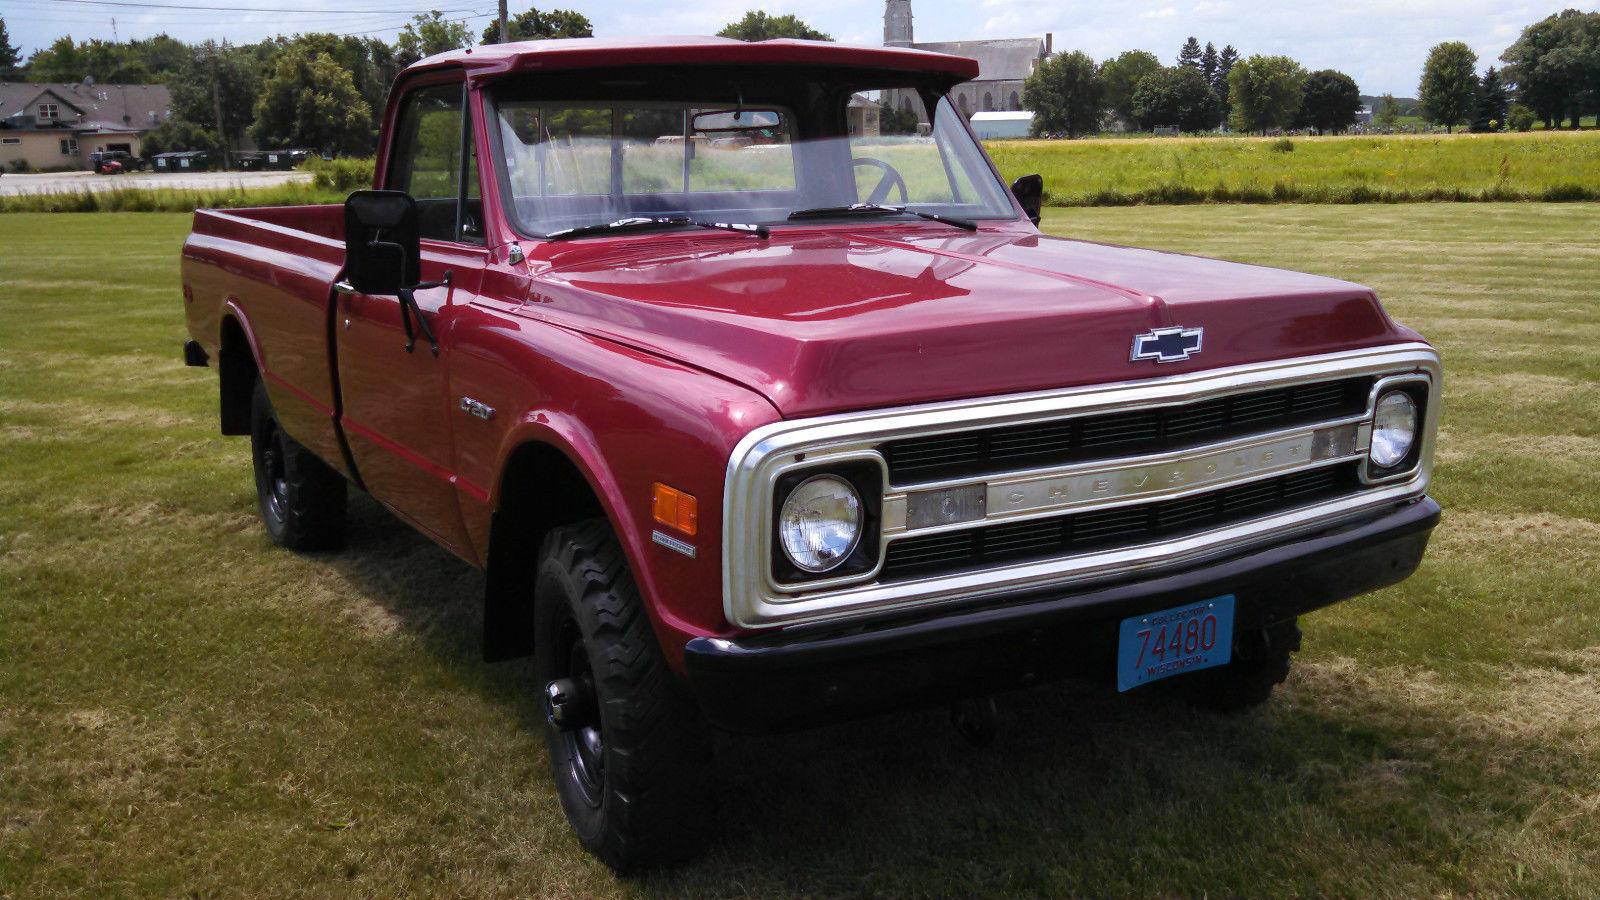 Chevy C X Spd Original Miles Rd Owner Restored on Chevy Equinox Firing Order